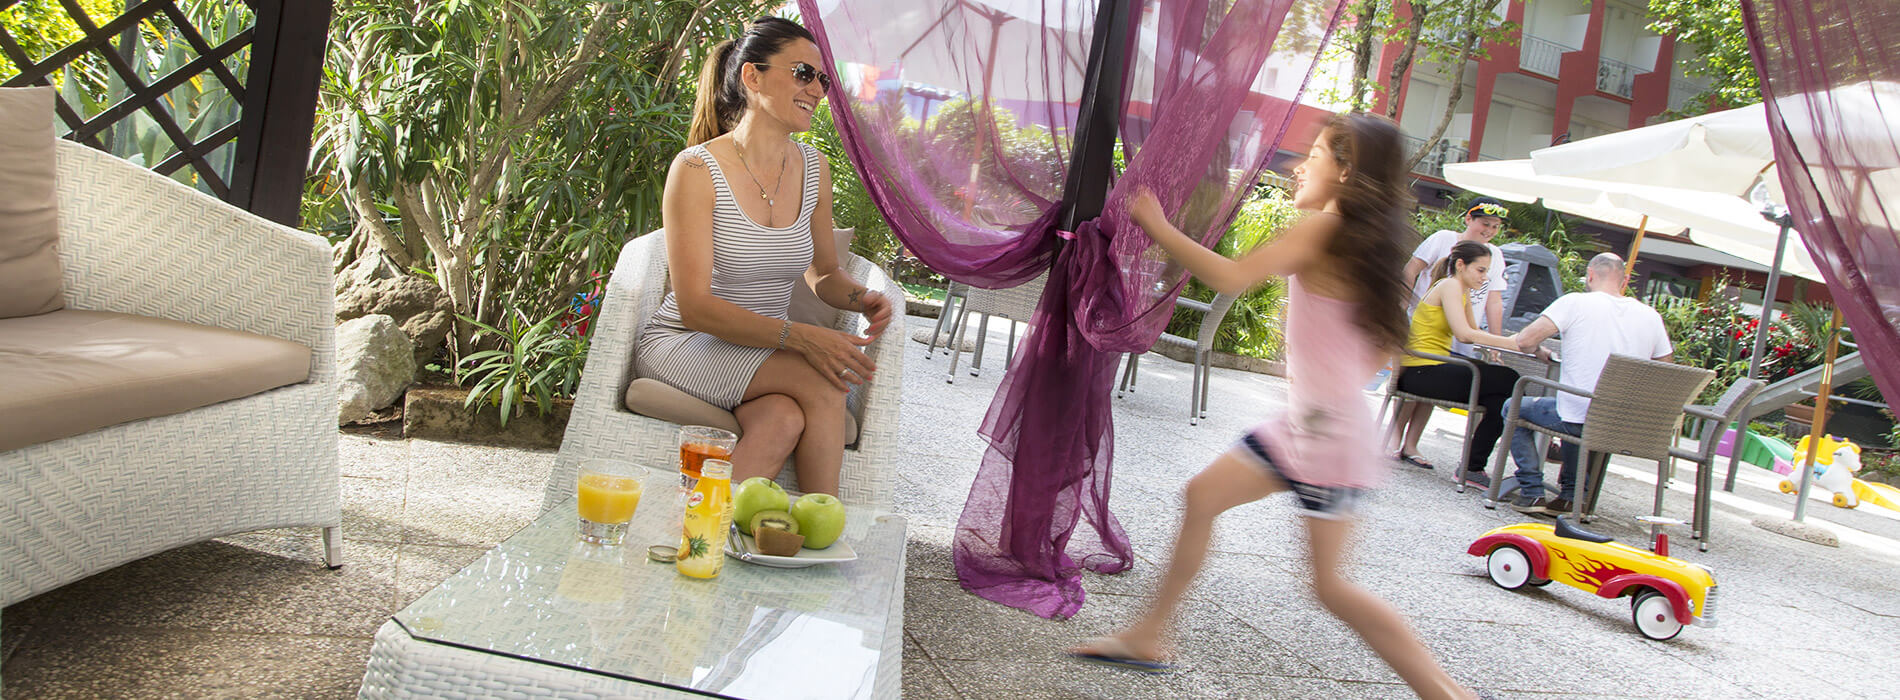 Hotel per famiglie e bambini a Bellaria Igea Marina